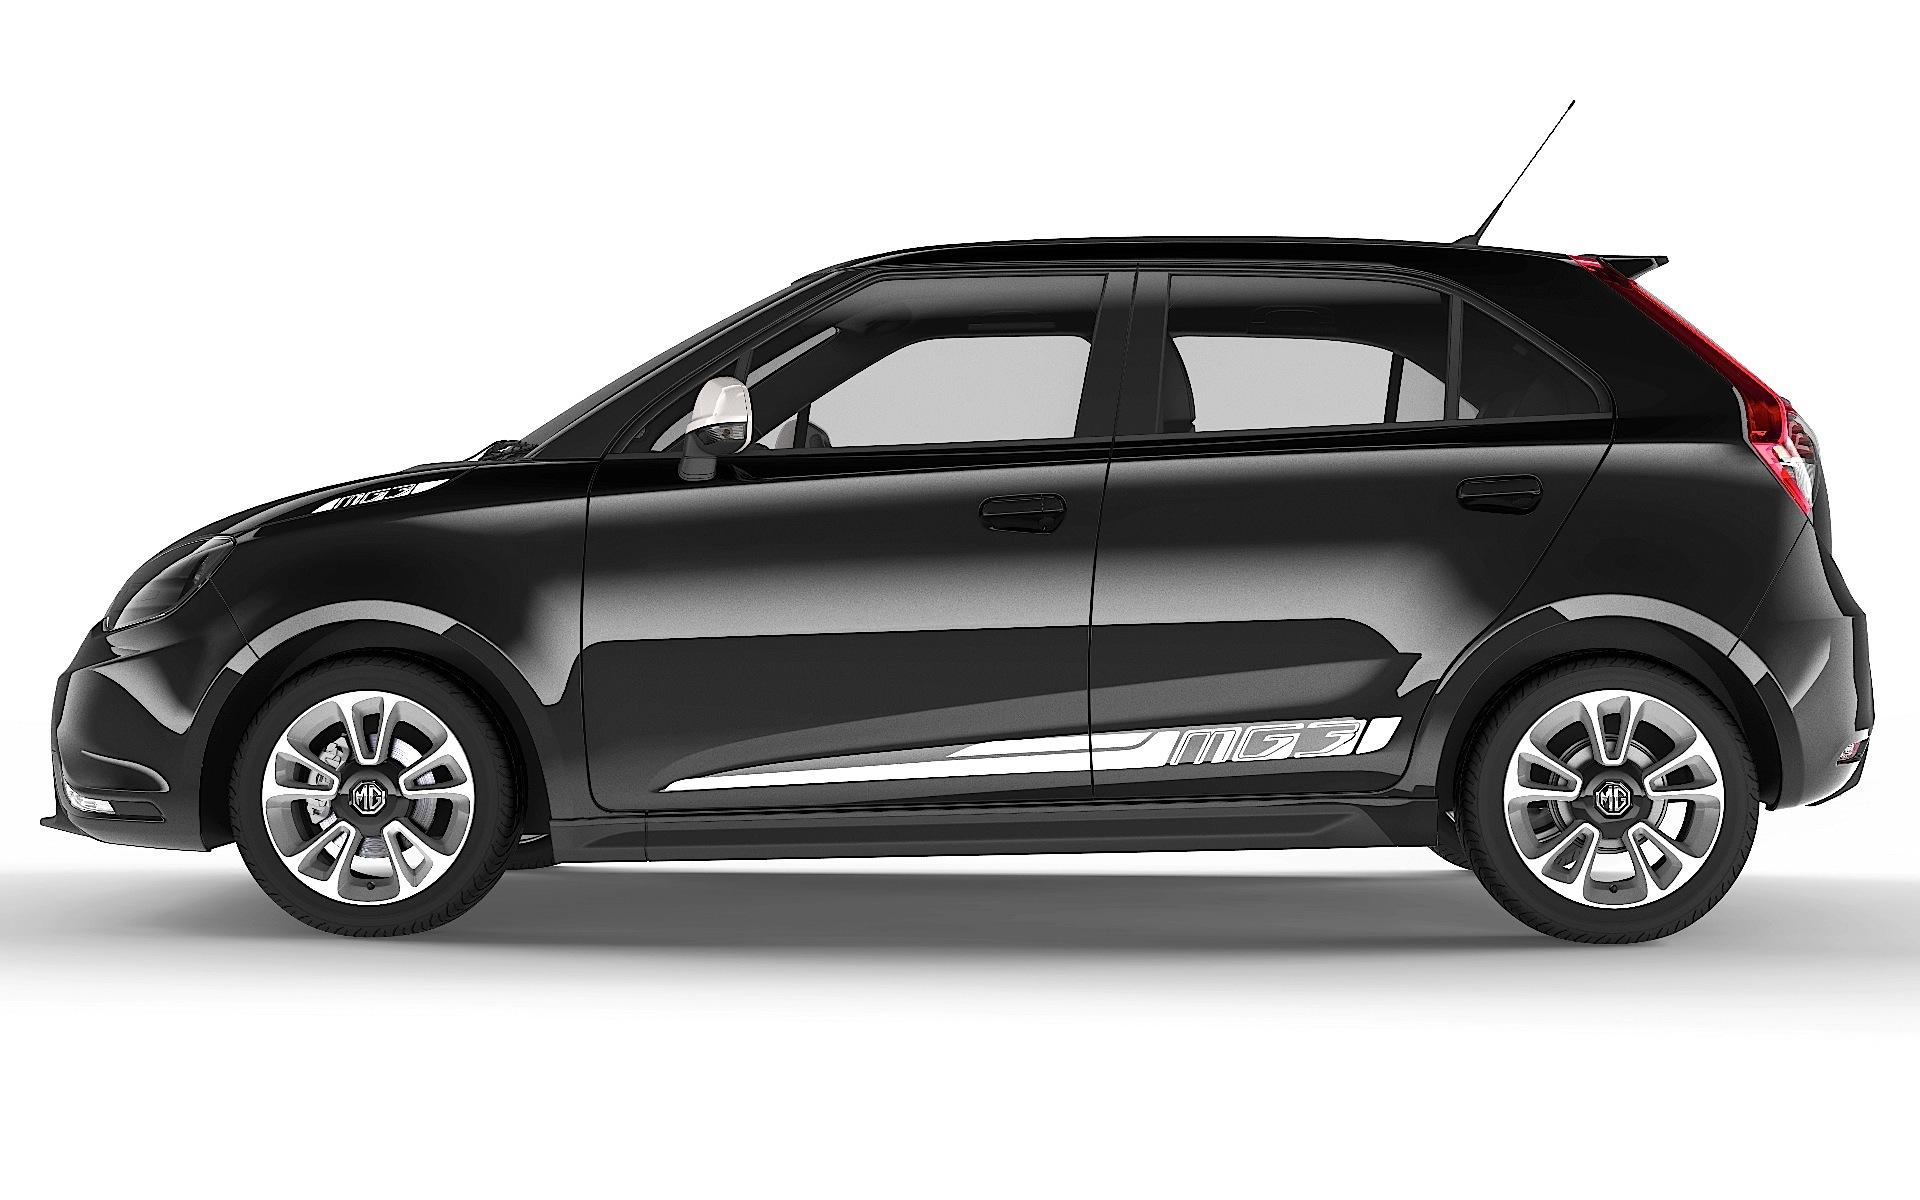 MG MG3 specs - 2013, 2014, 2015, 2016, 2017, 2018 - autoevolution